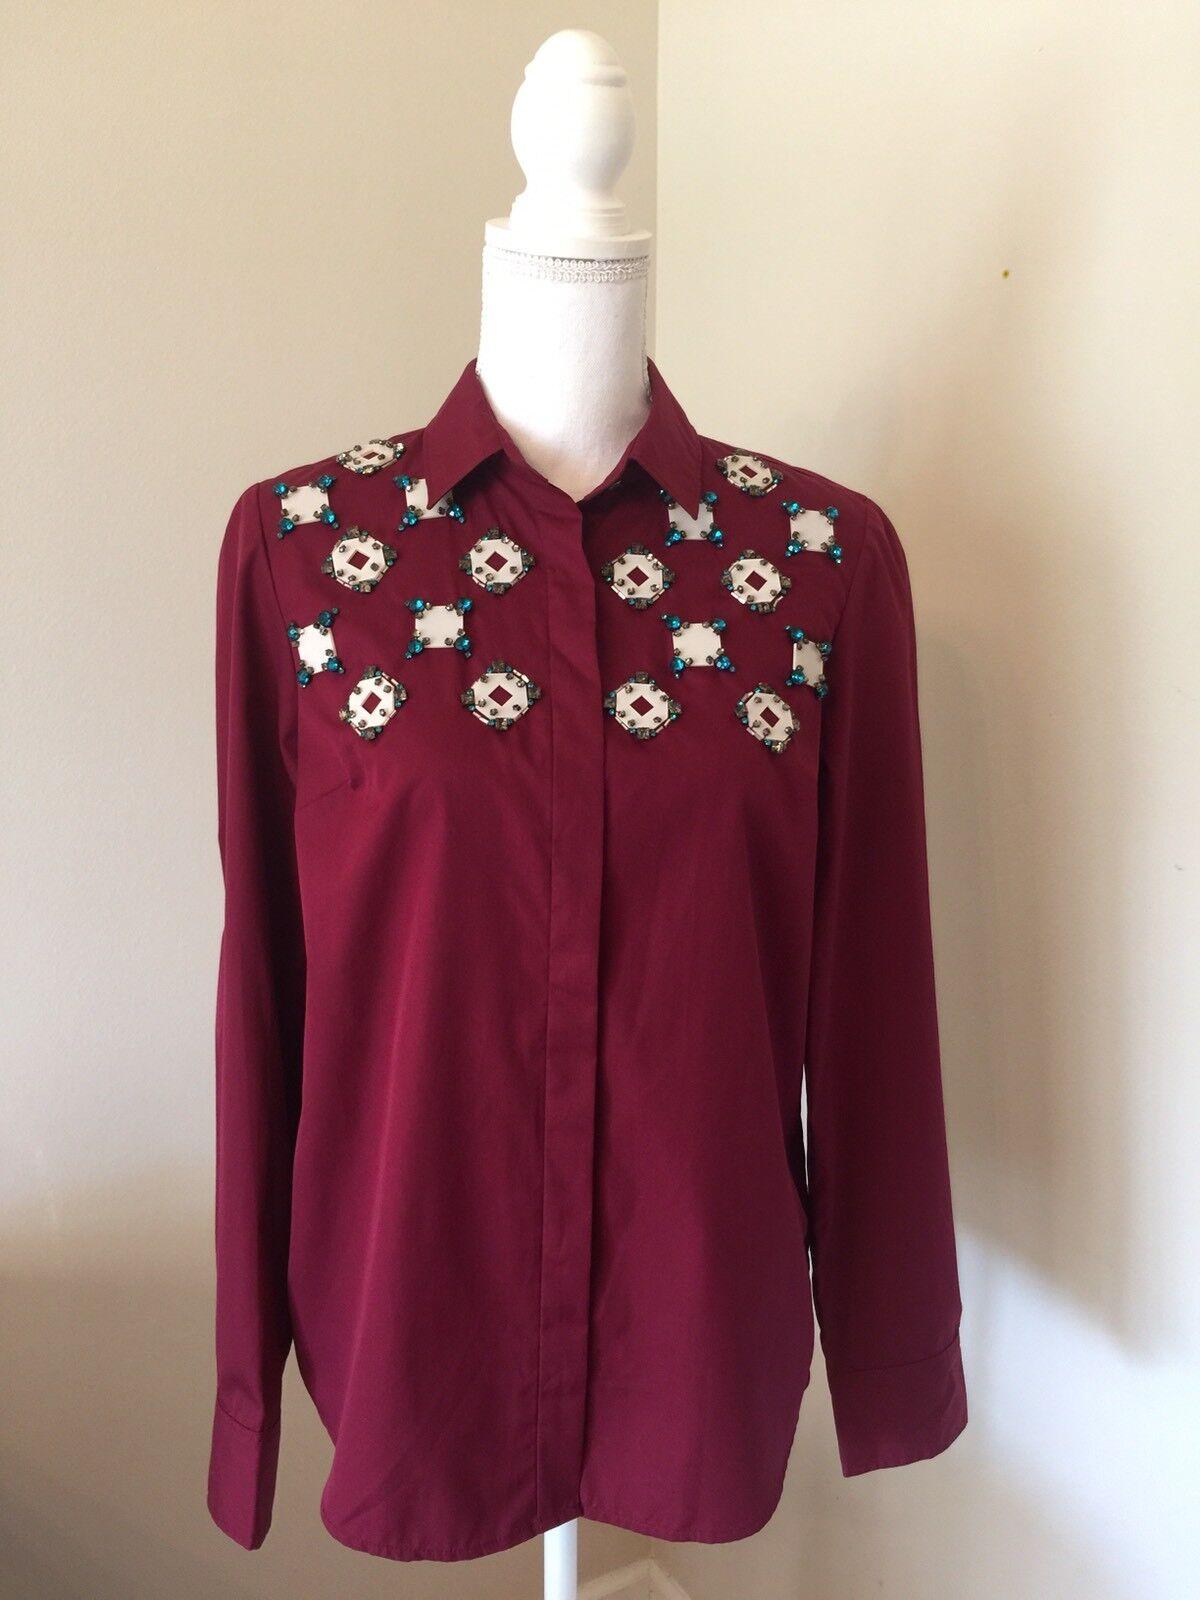 NWOT J Crew Collection Jeweled Geo Shirt Burgundy Sz 6 B0258  Sample Item